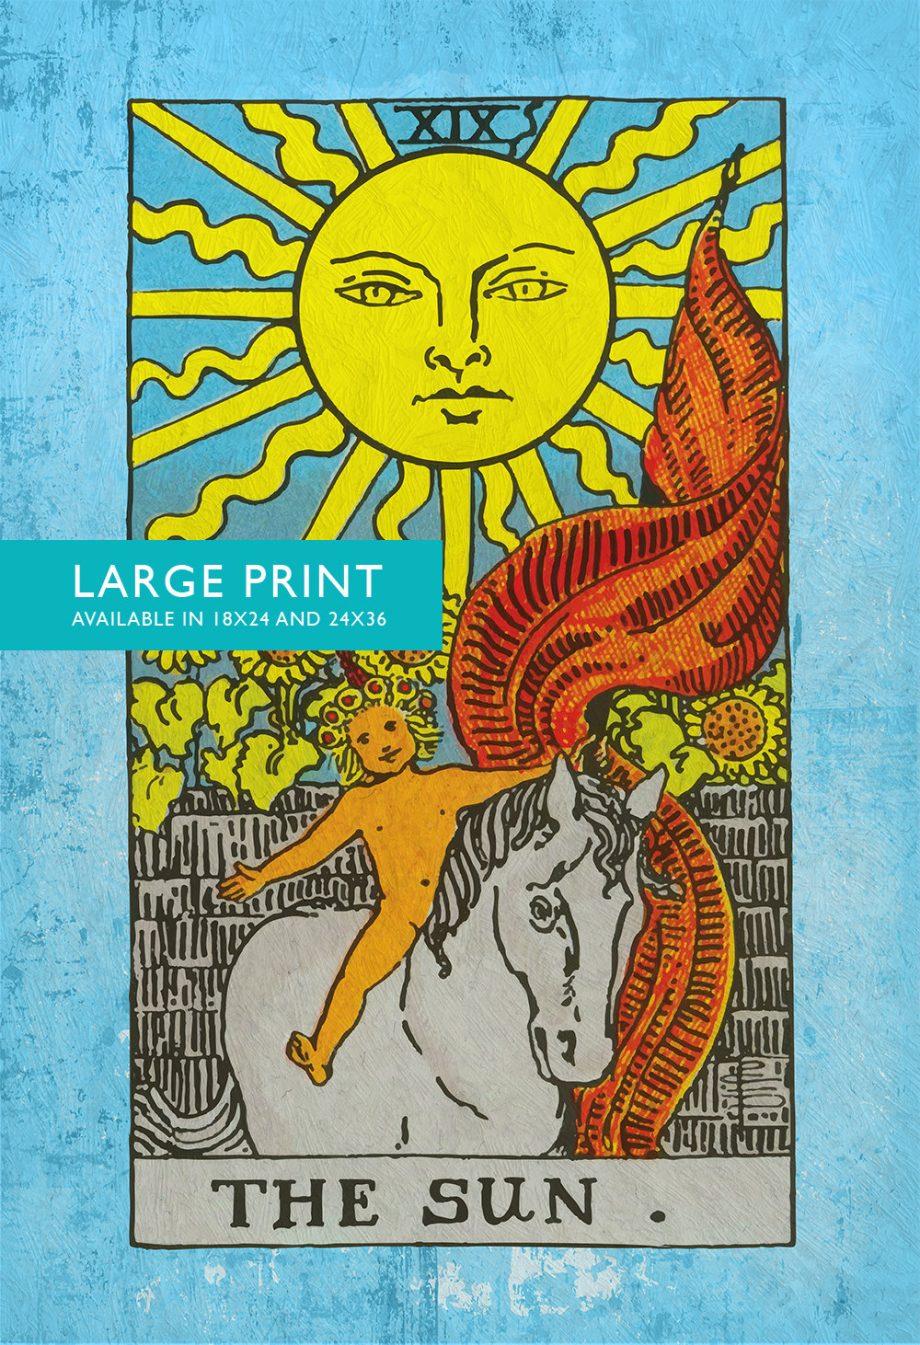 Tarot Print The Sun Retro Illustration Art Rider Print Vintage Giclee on Cotton Canvas and Satin Photo Paper